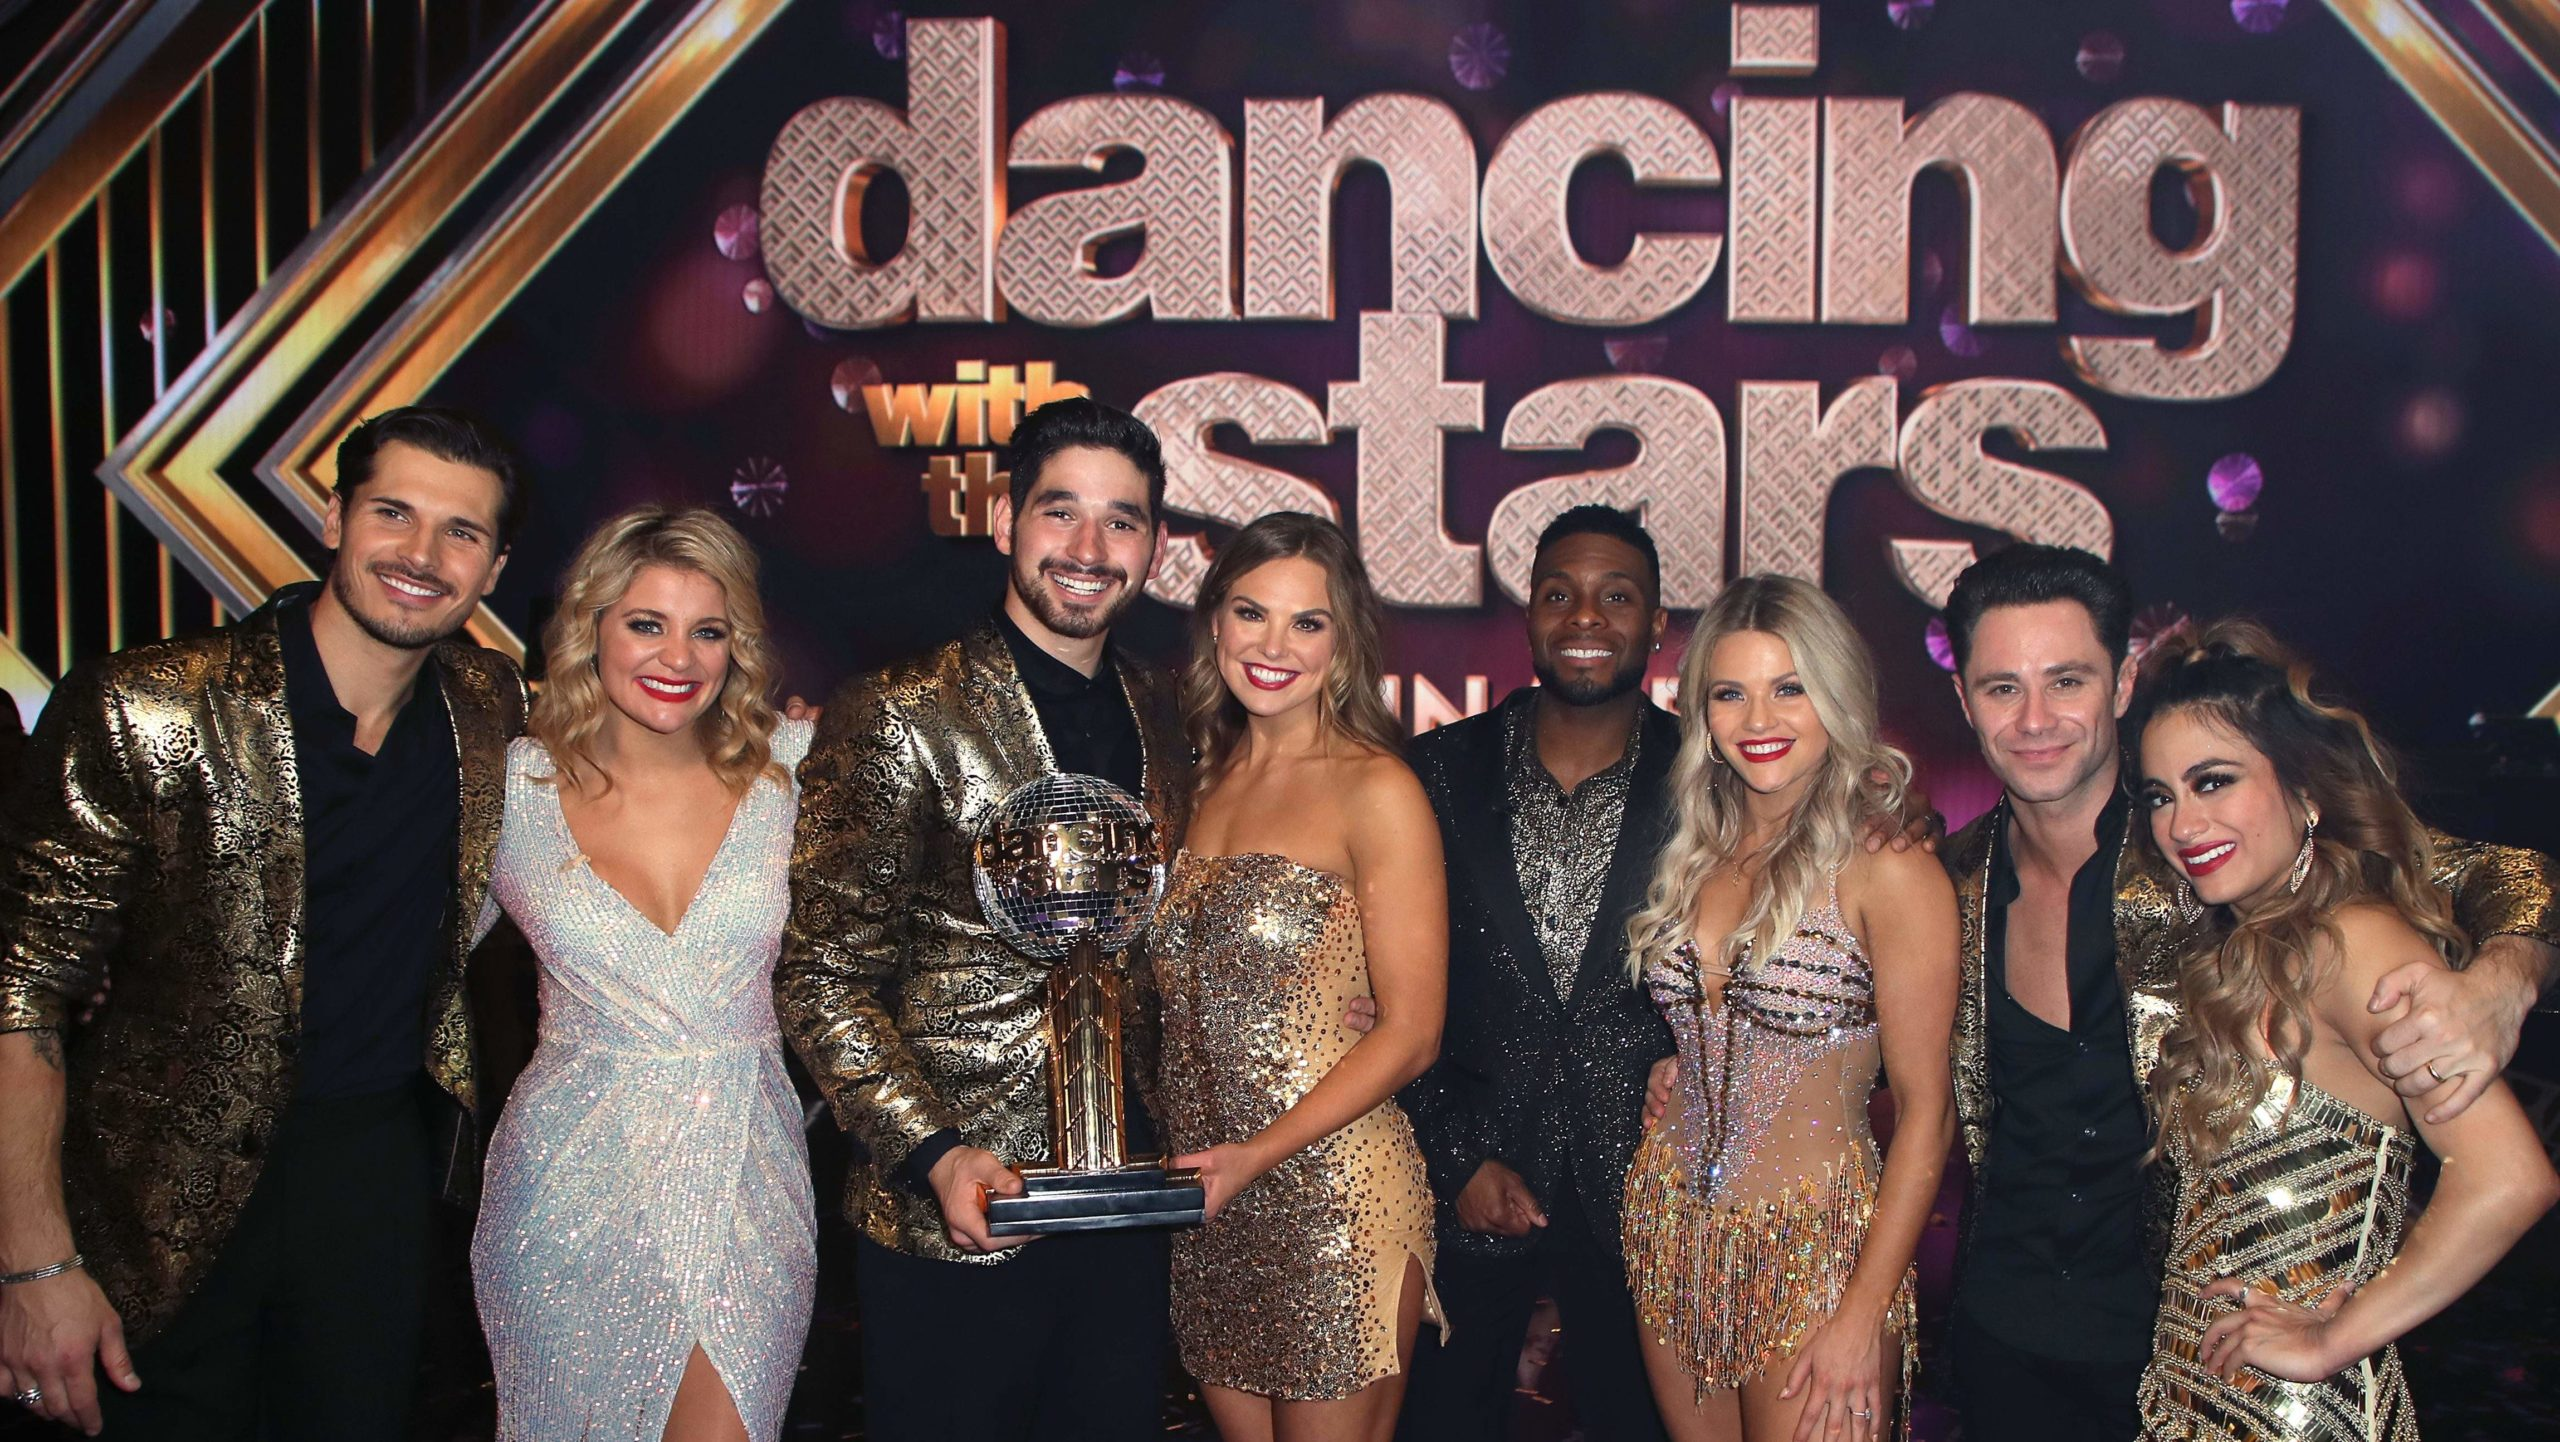 dancing with the stars season 10